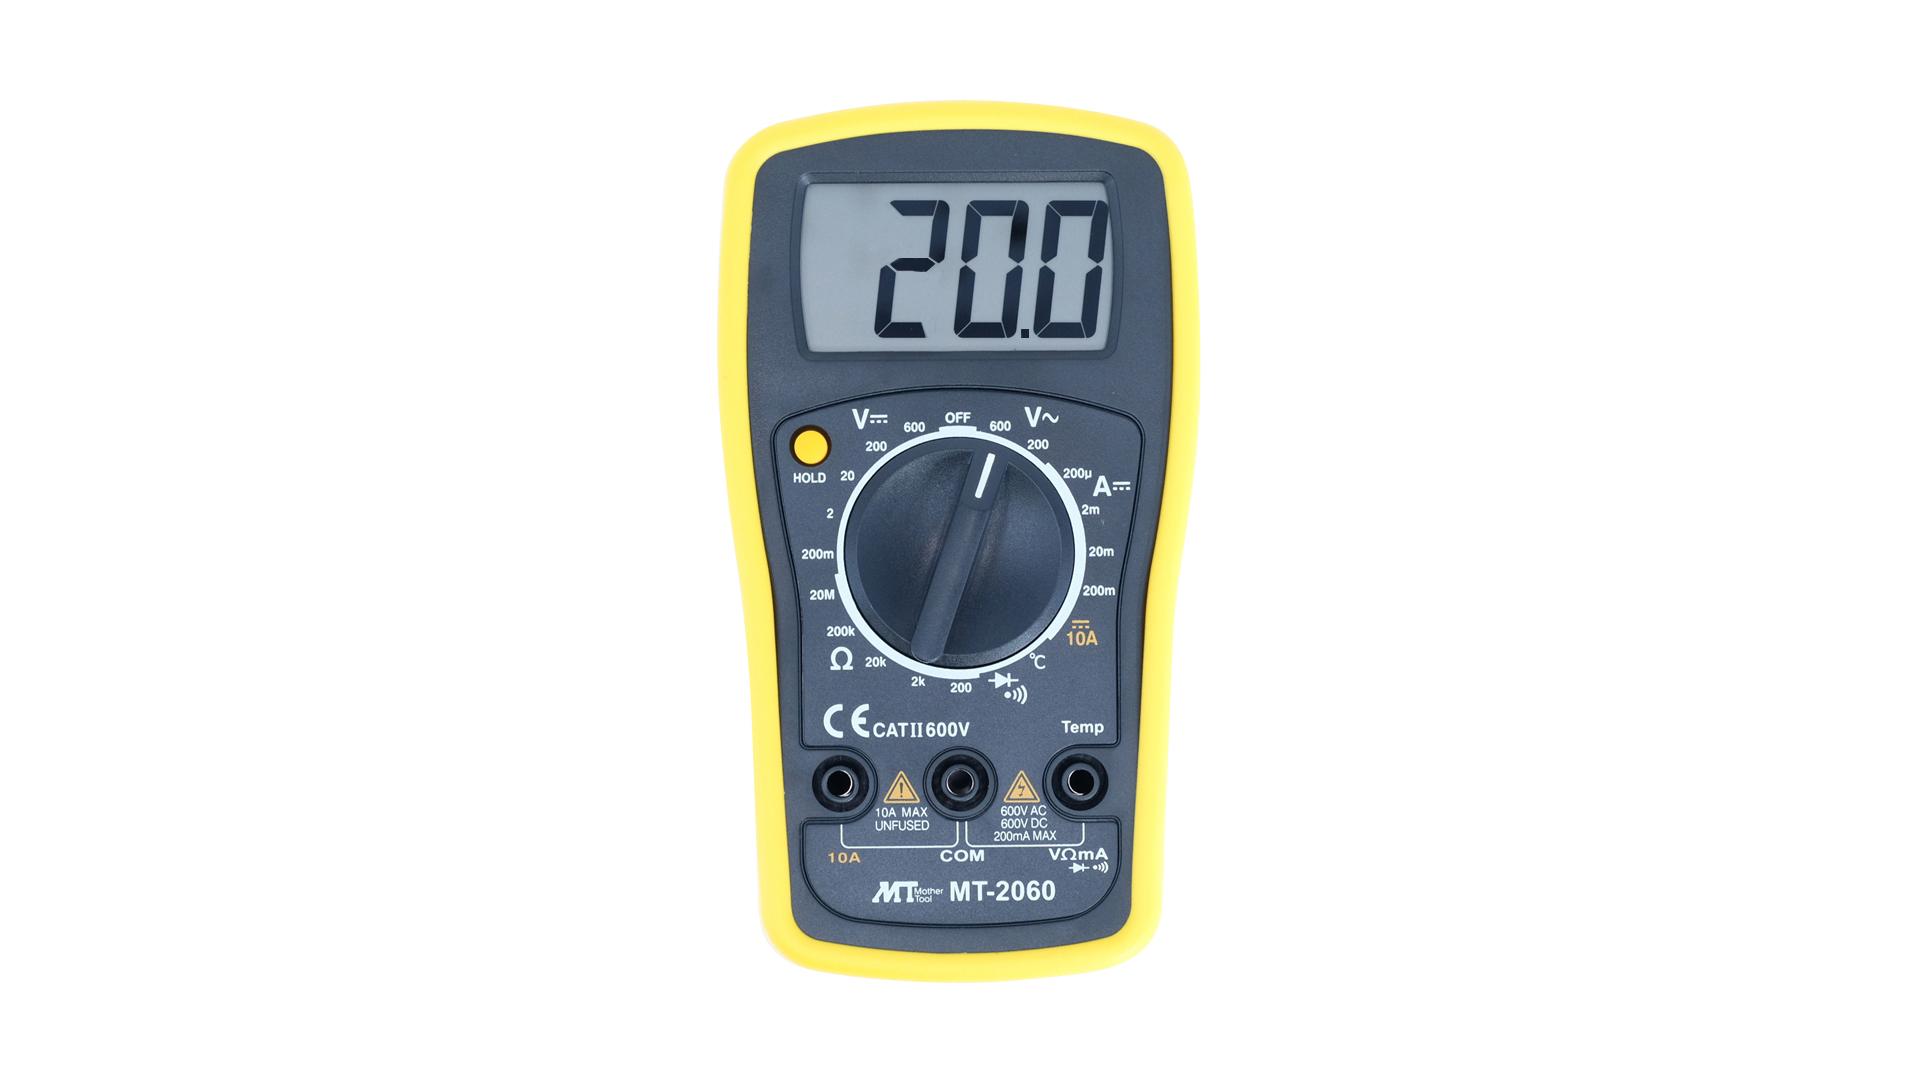 MT-2060